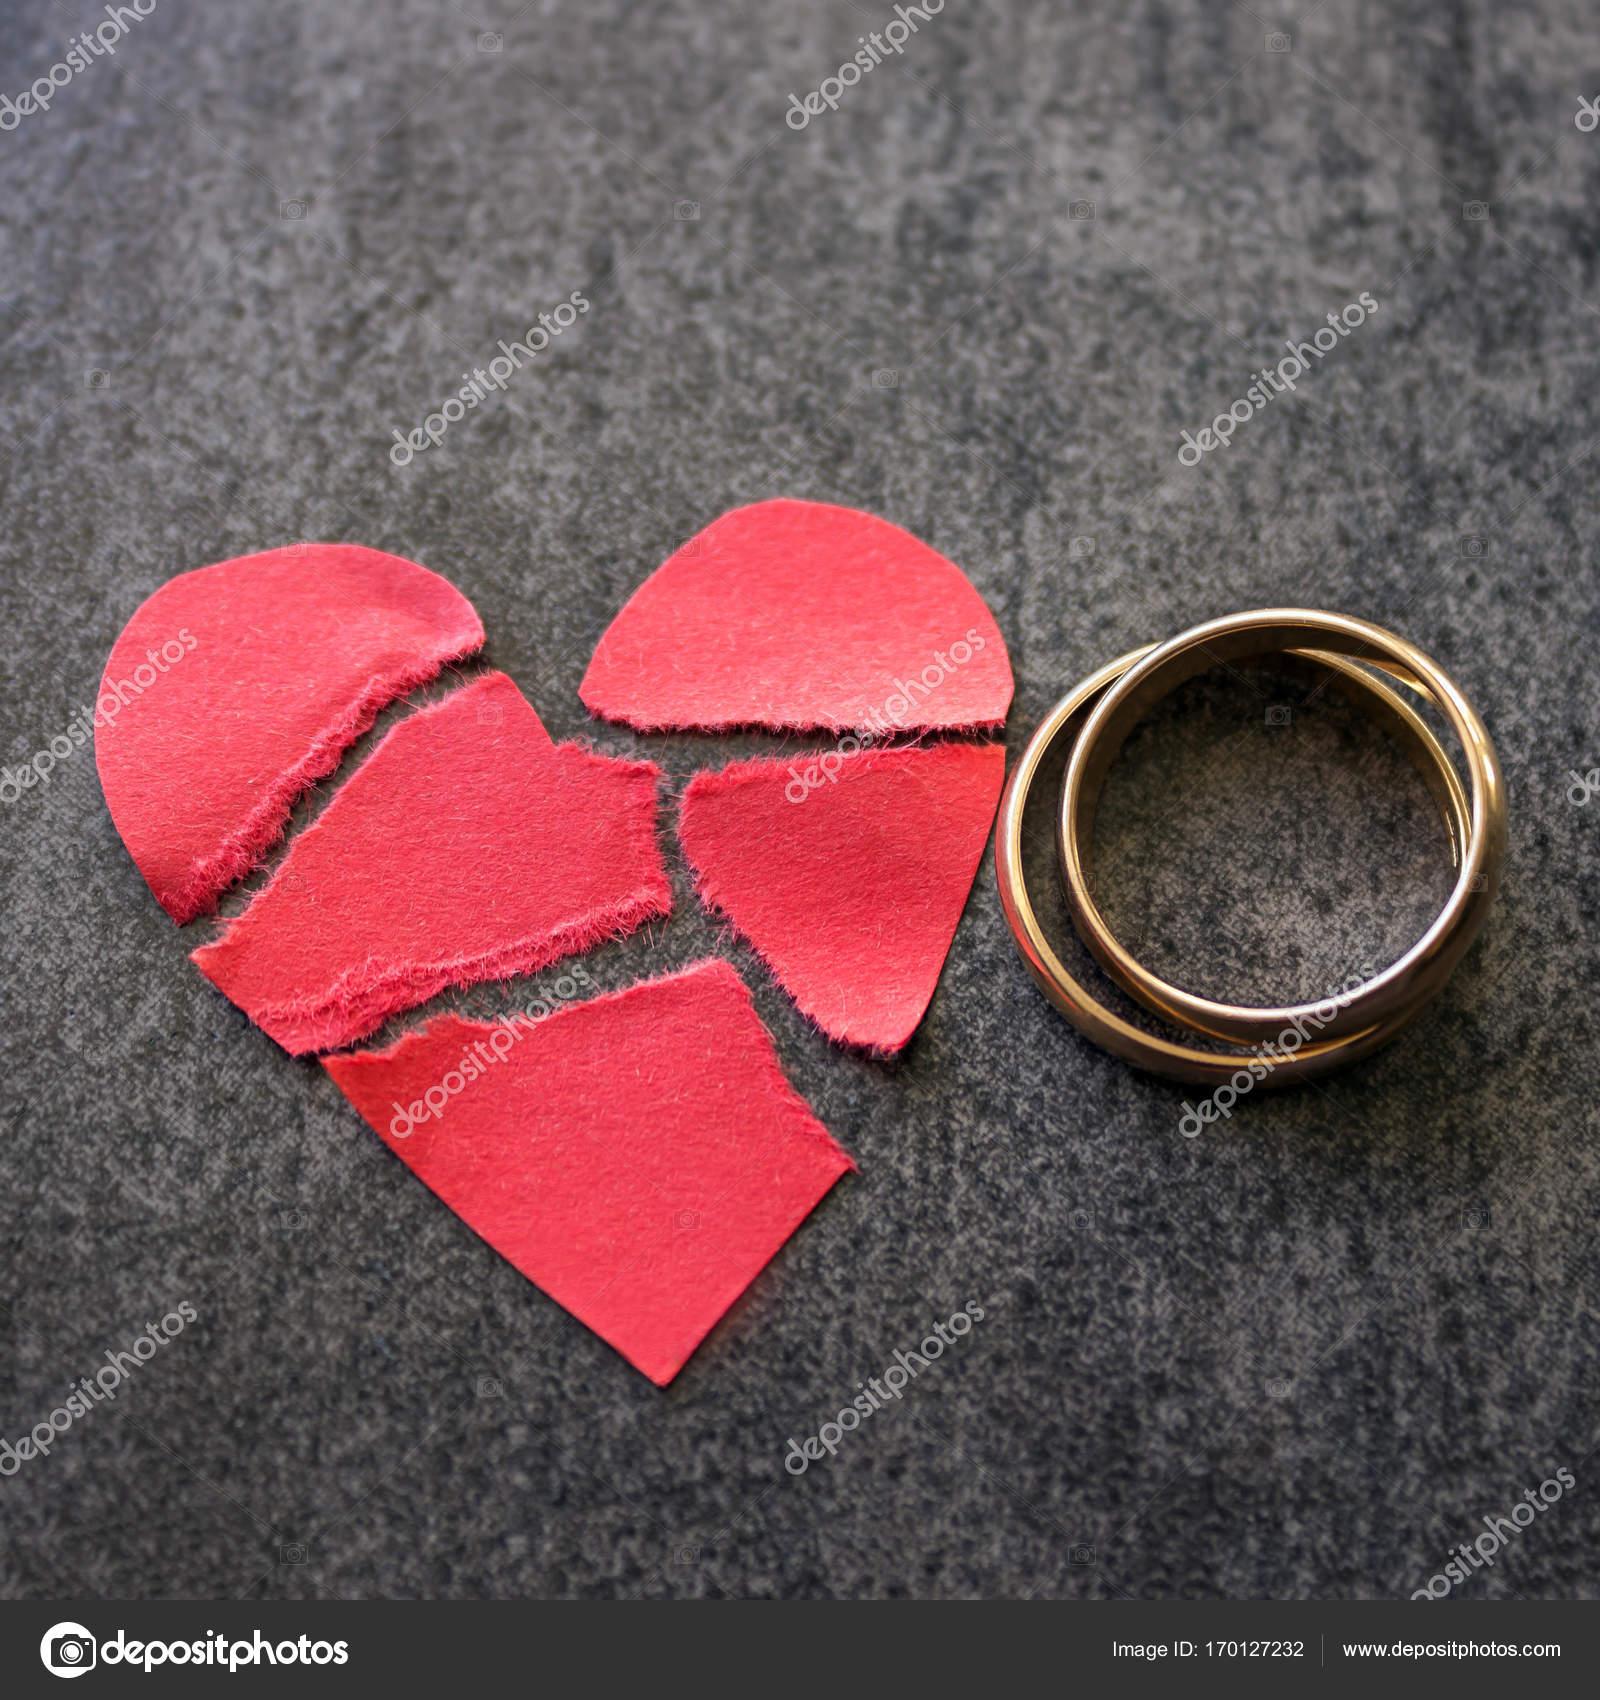 Snubni Prsteny A Rozbite Cervene Srdce Cerne Pozadi Conce Stock